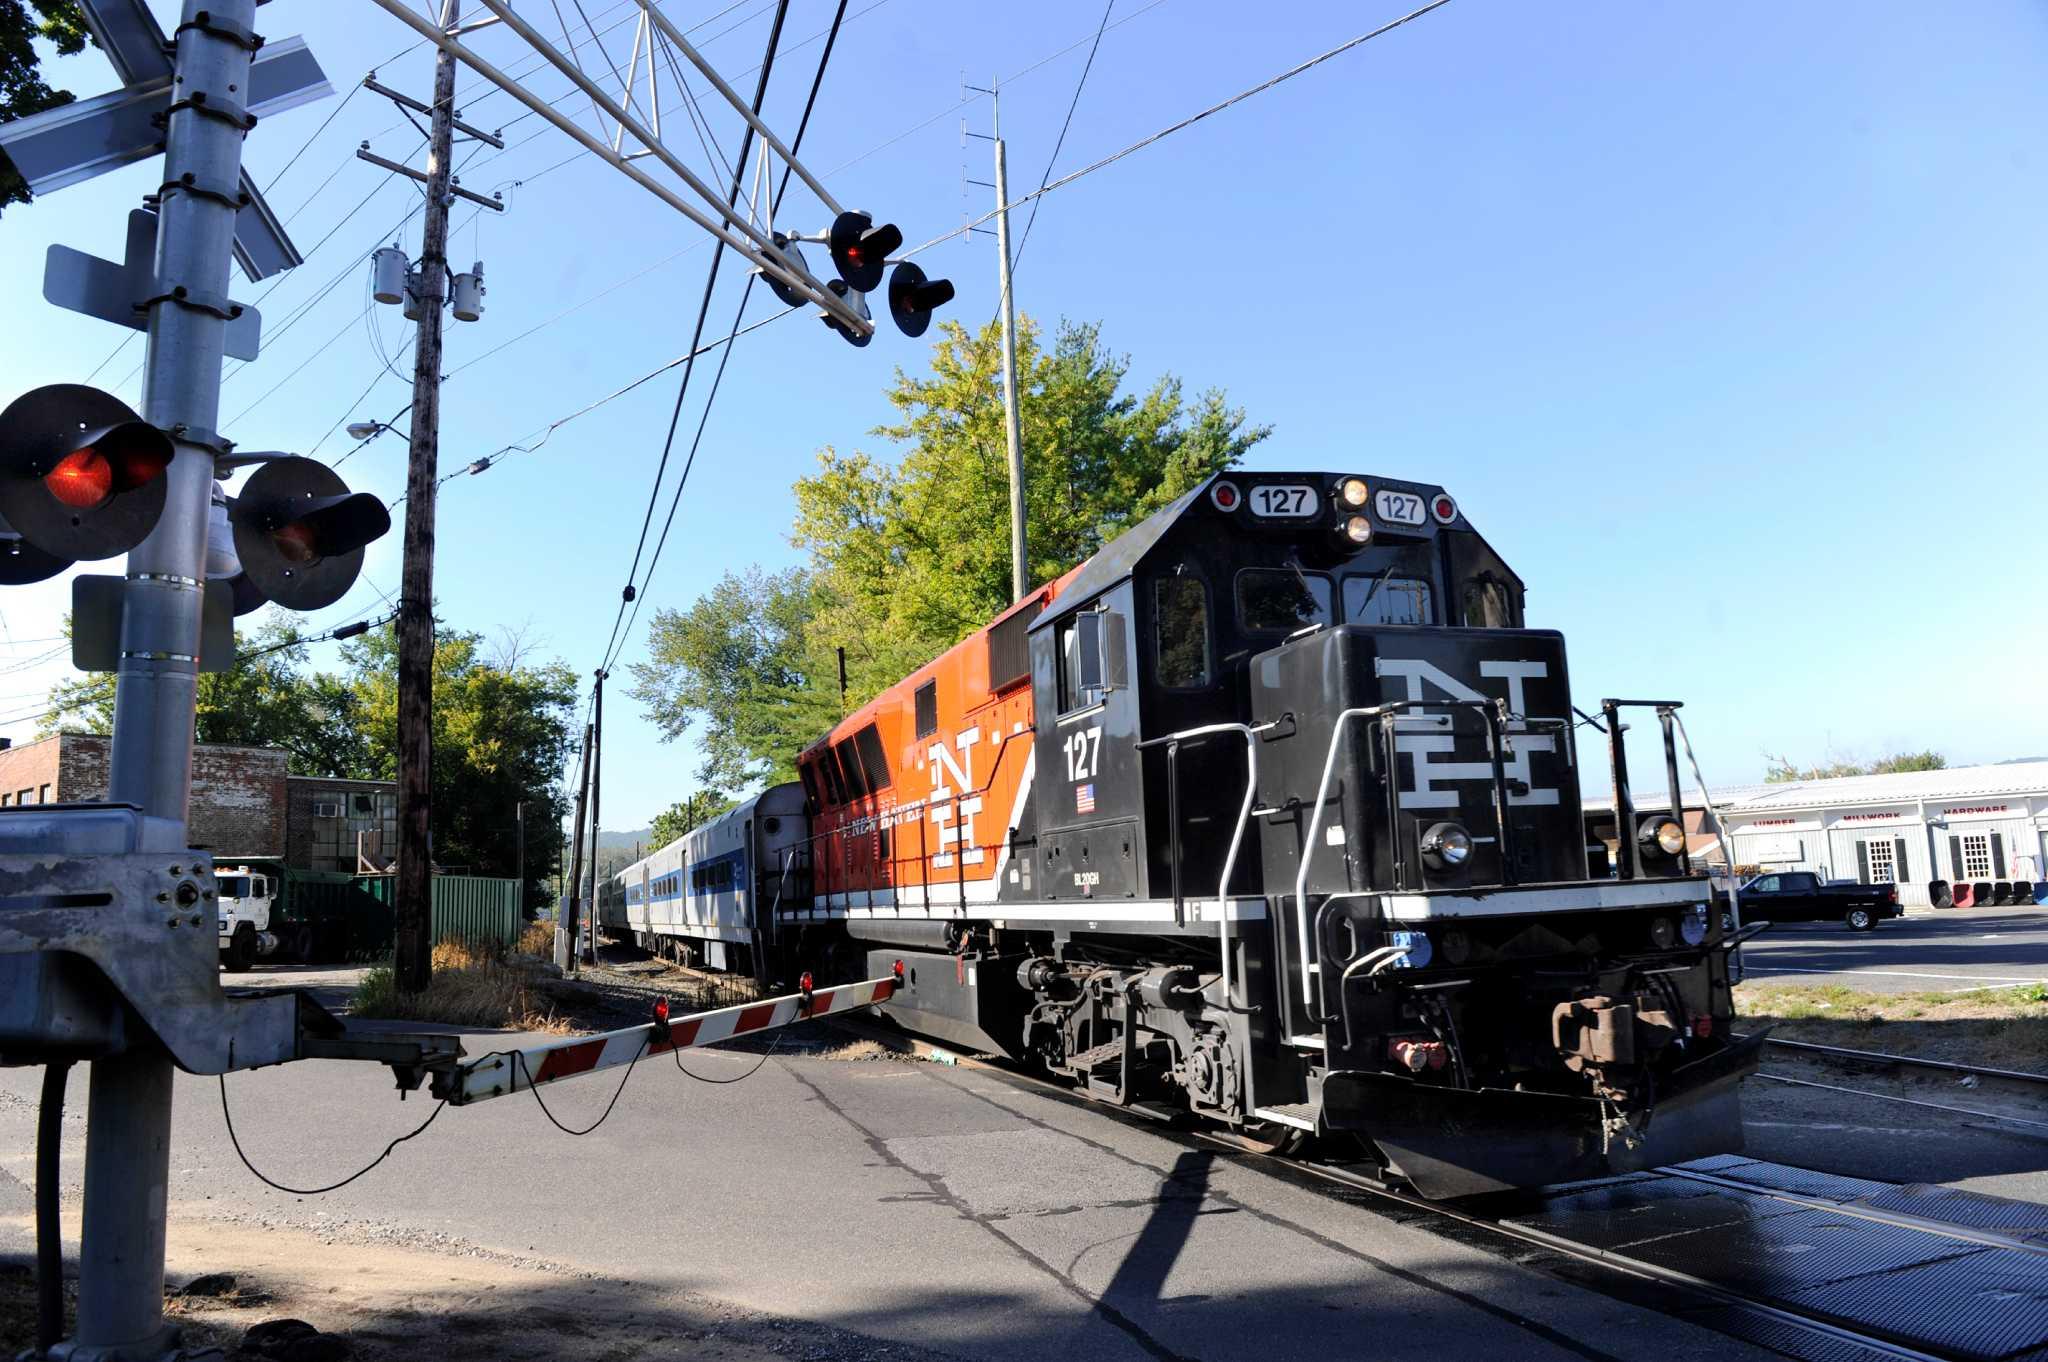 Train service to pick up on Danbury line - NewsTimes